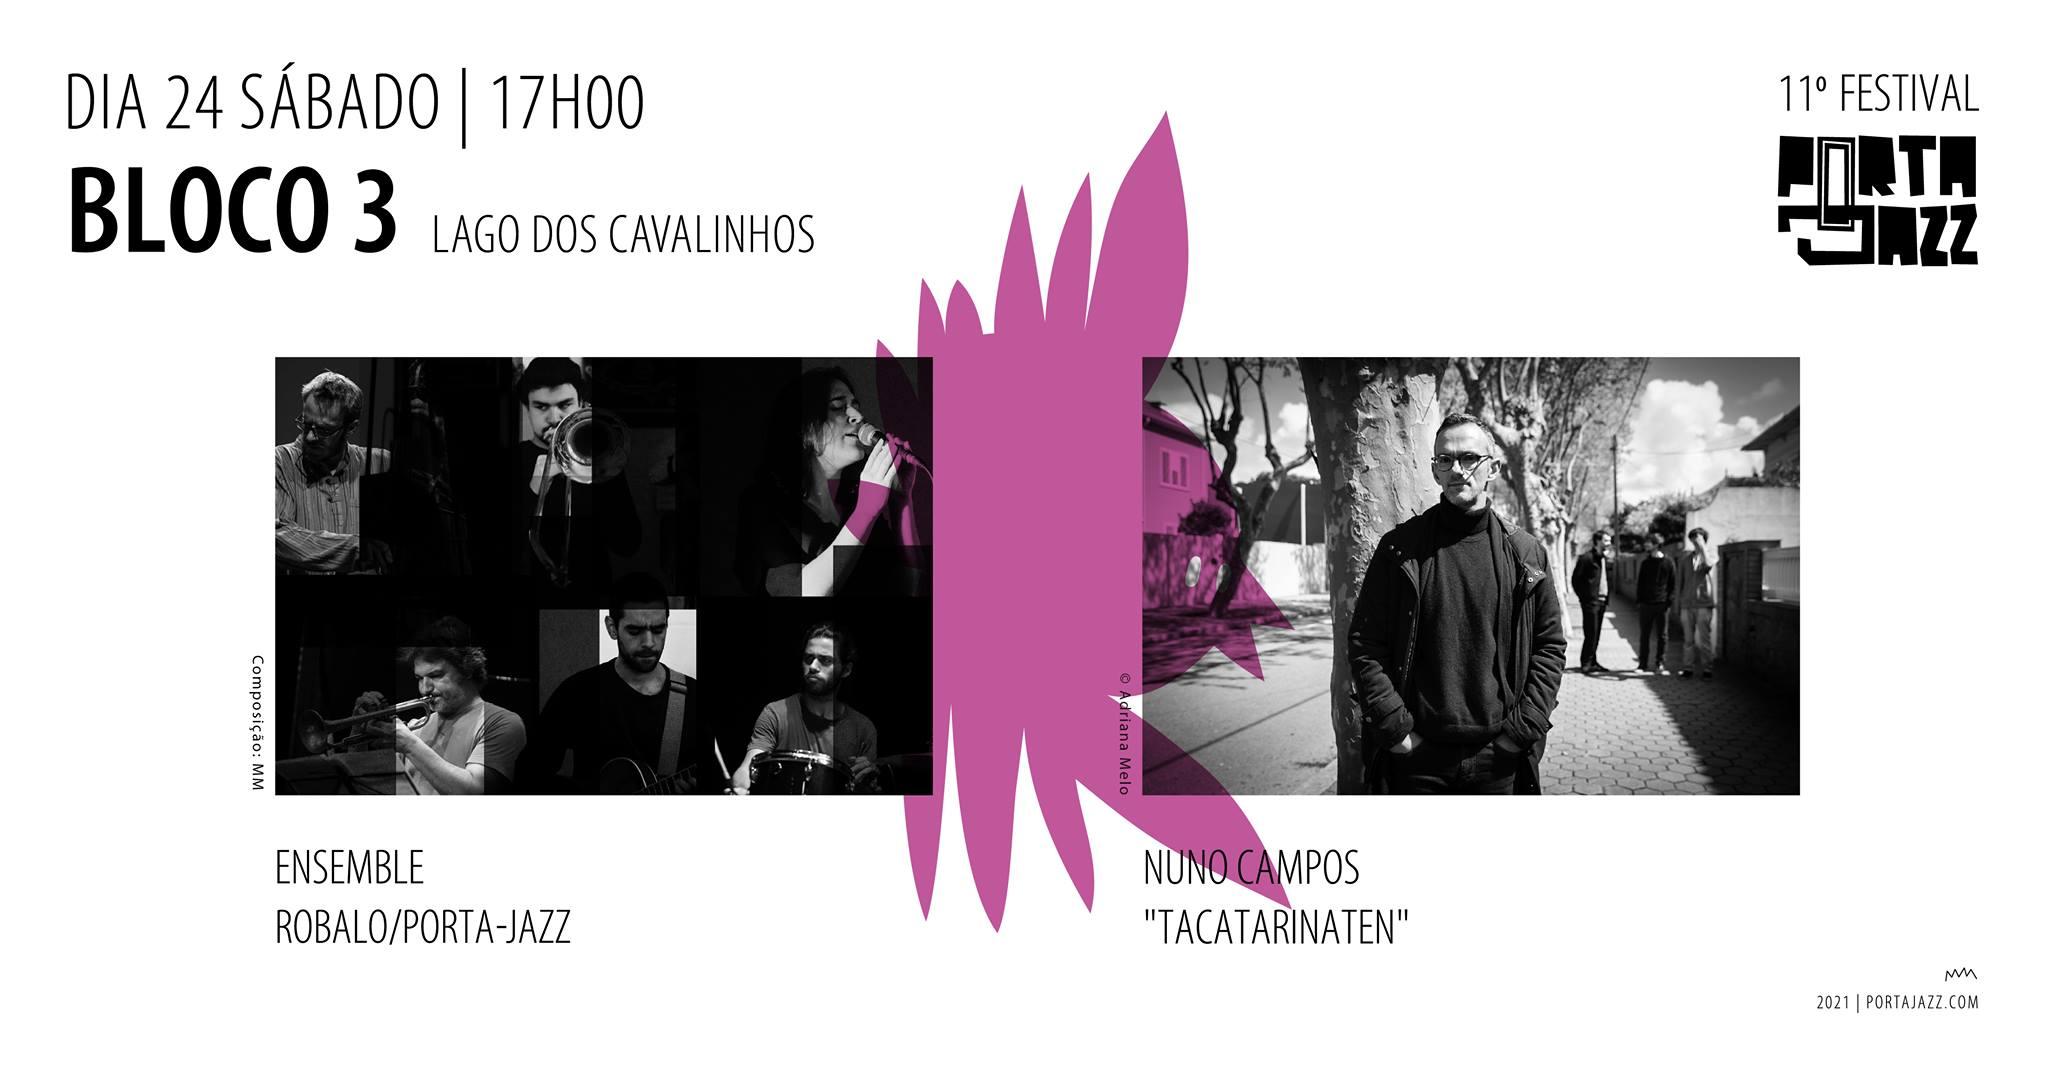 11º Festival Porta-Jazz || Bloco 3 | Ensemble Robalo/Porta-Jazz + Nuno Campos 'TaCatarinaTen'